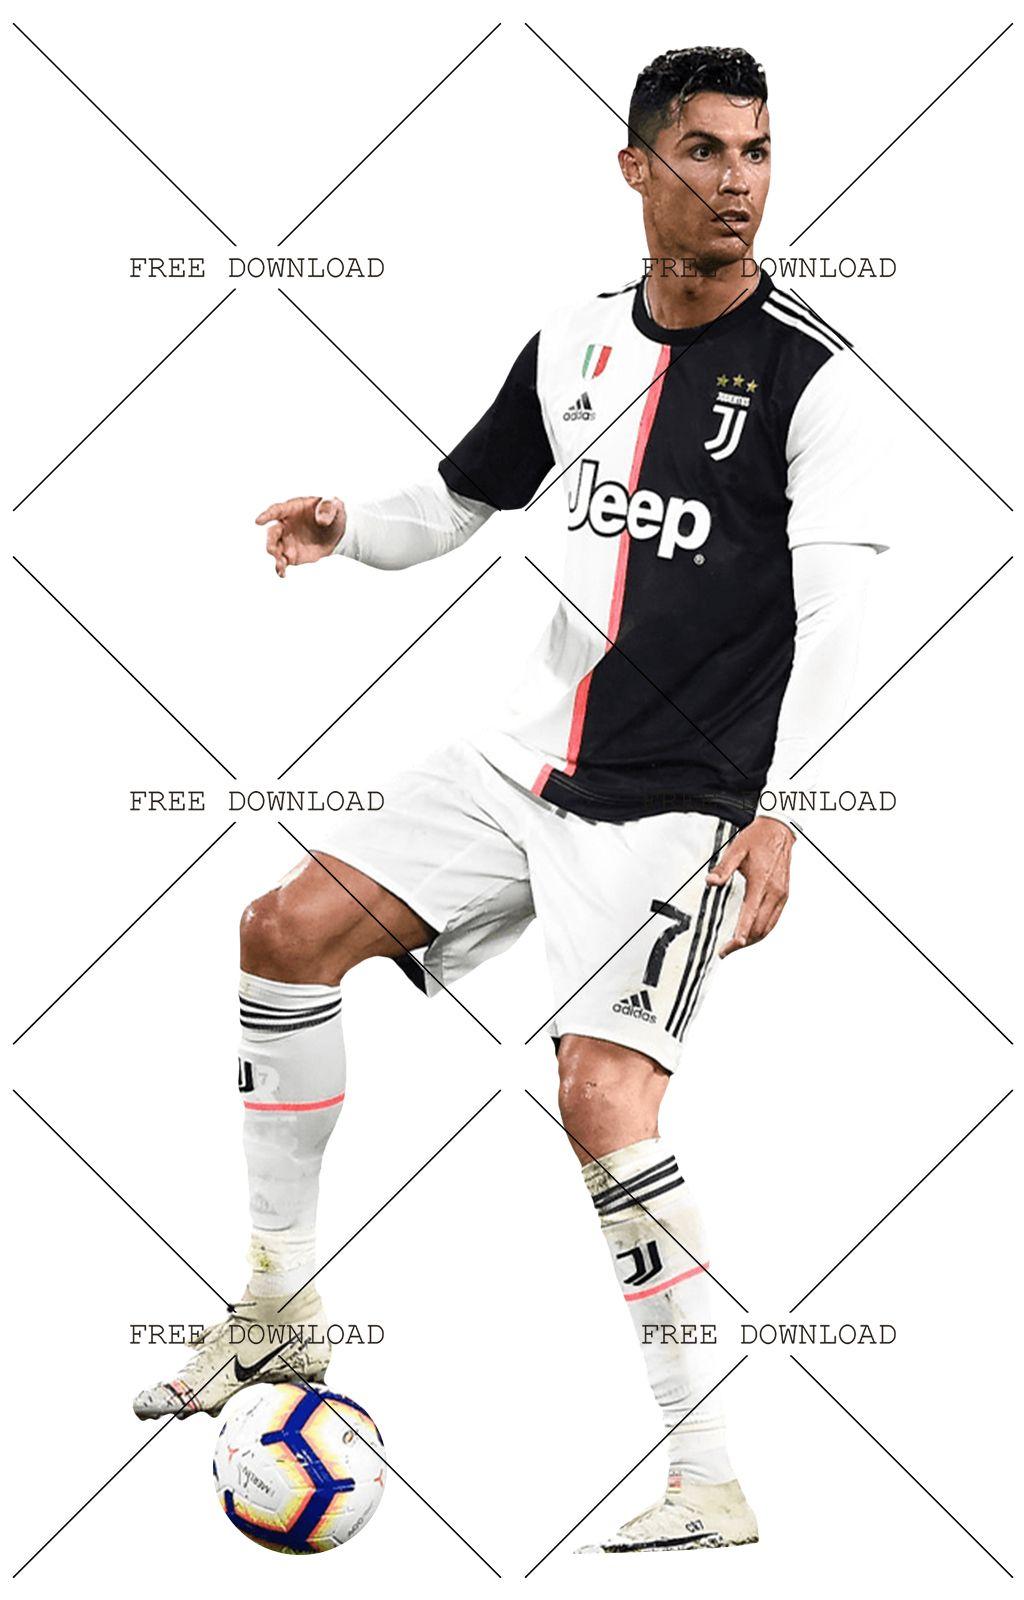 Cristiano Ronaldo Png Image With Transparent Background Cristiano Ronaldo Ronaldo Cristiano Ronaldo Juventus